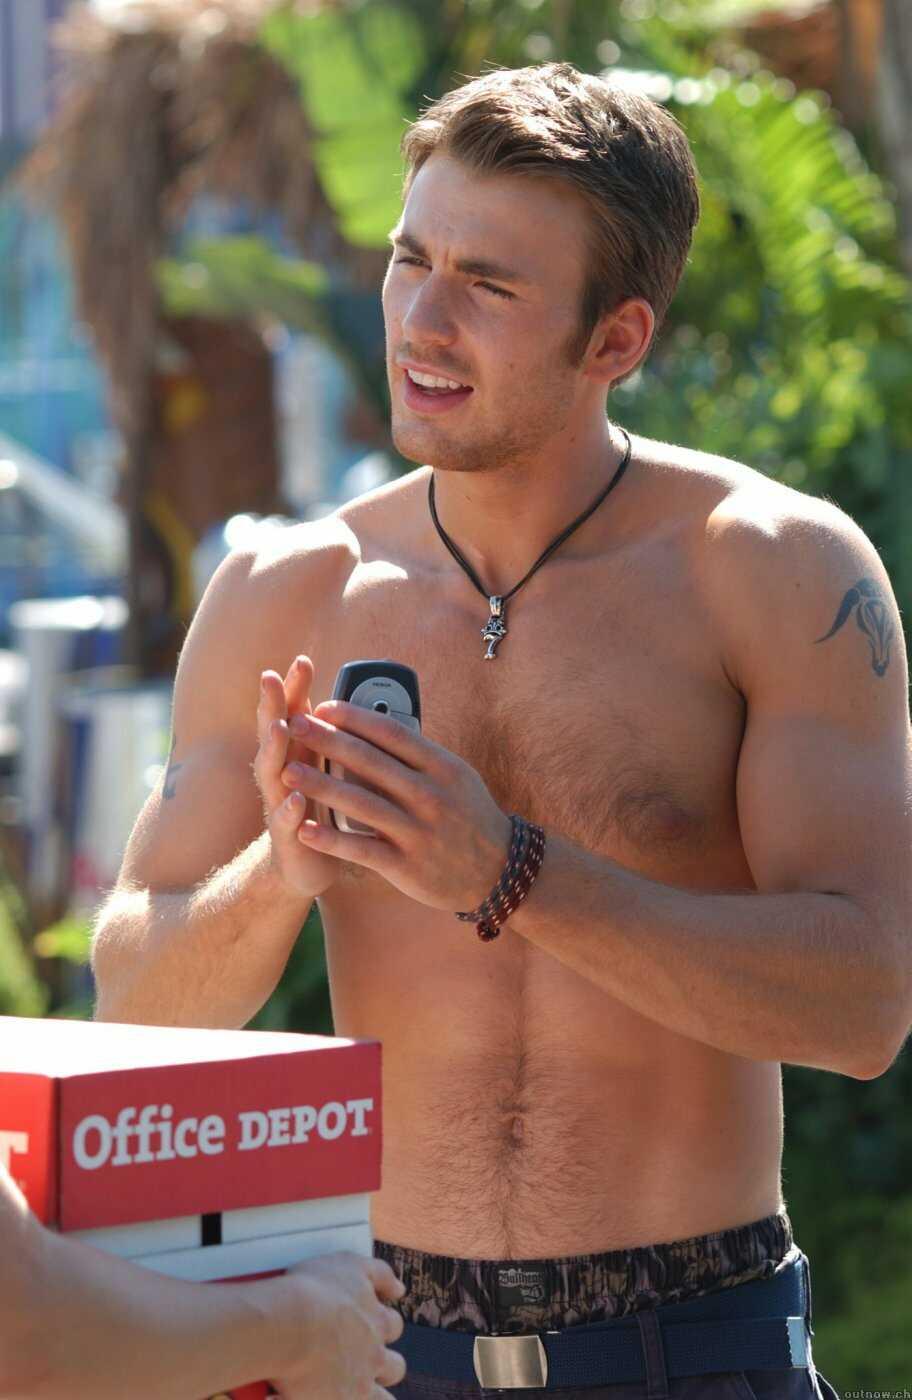 Hot Pictures Of Celebrities in Nude,Photos,Bikini,Hot,Pics